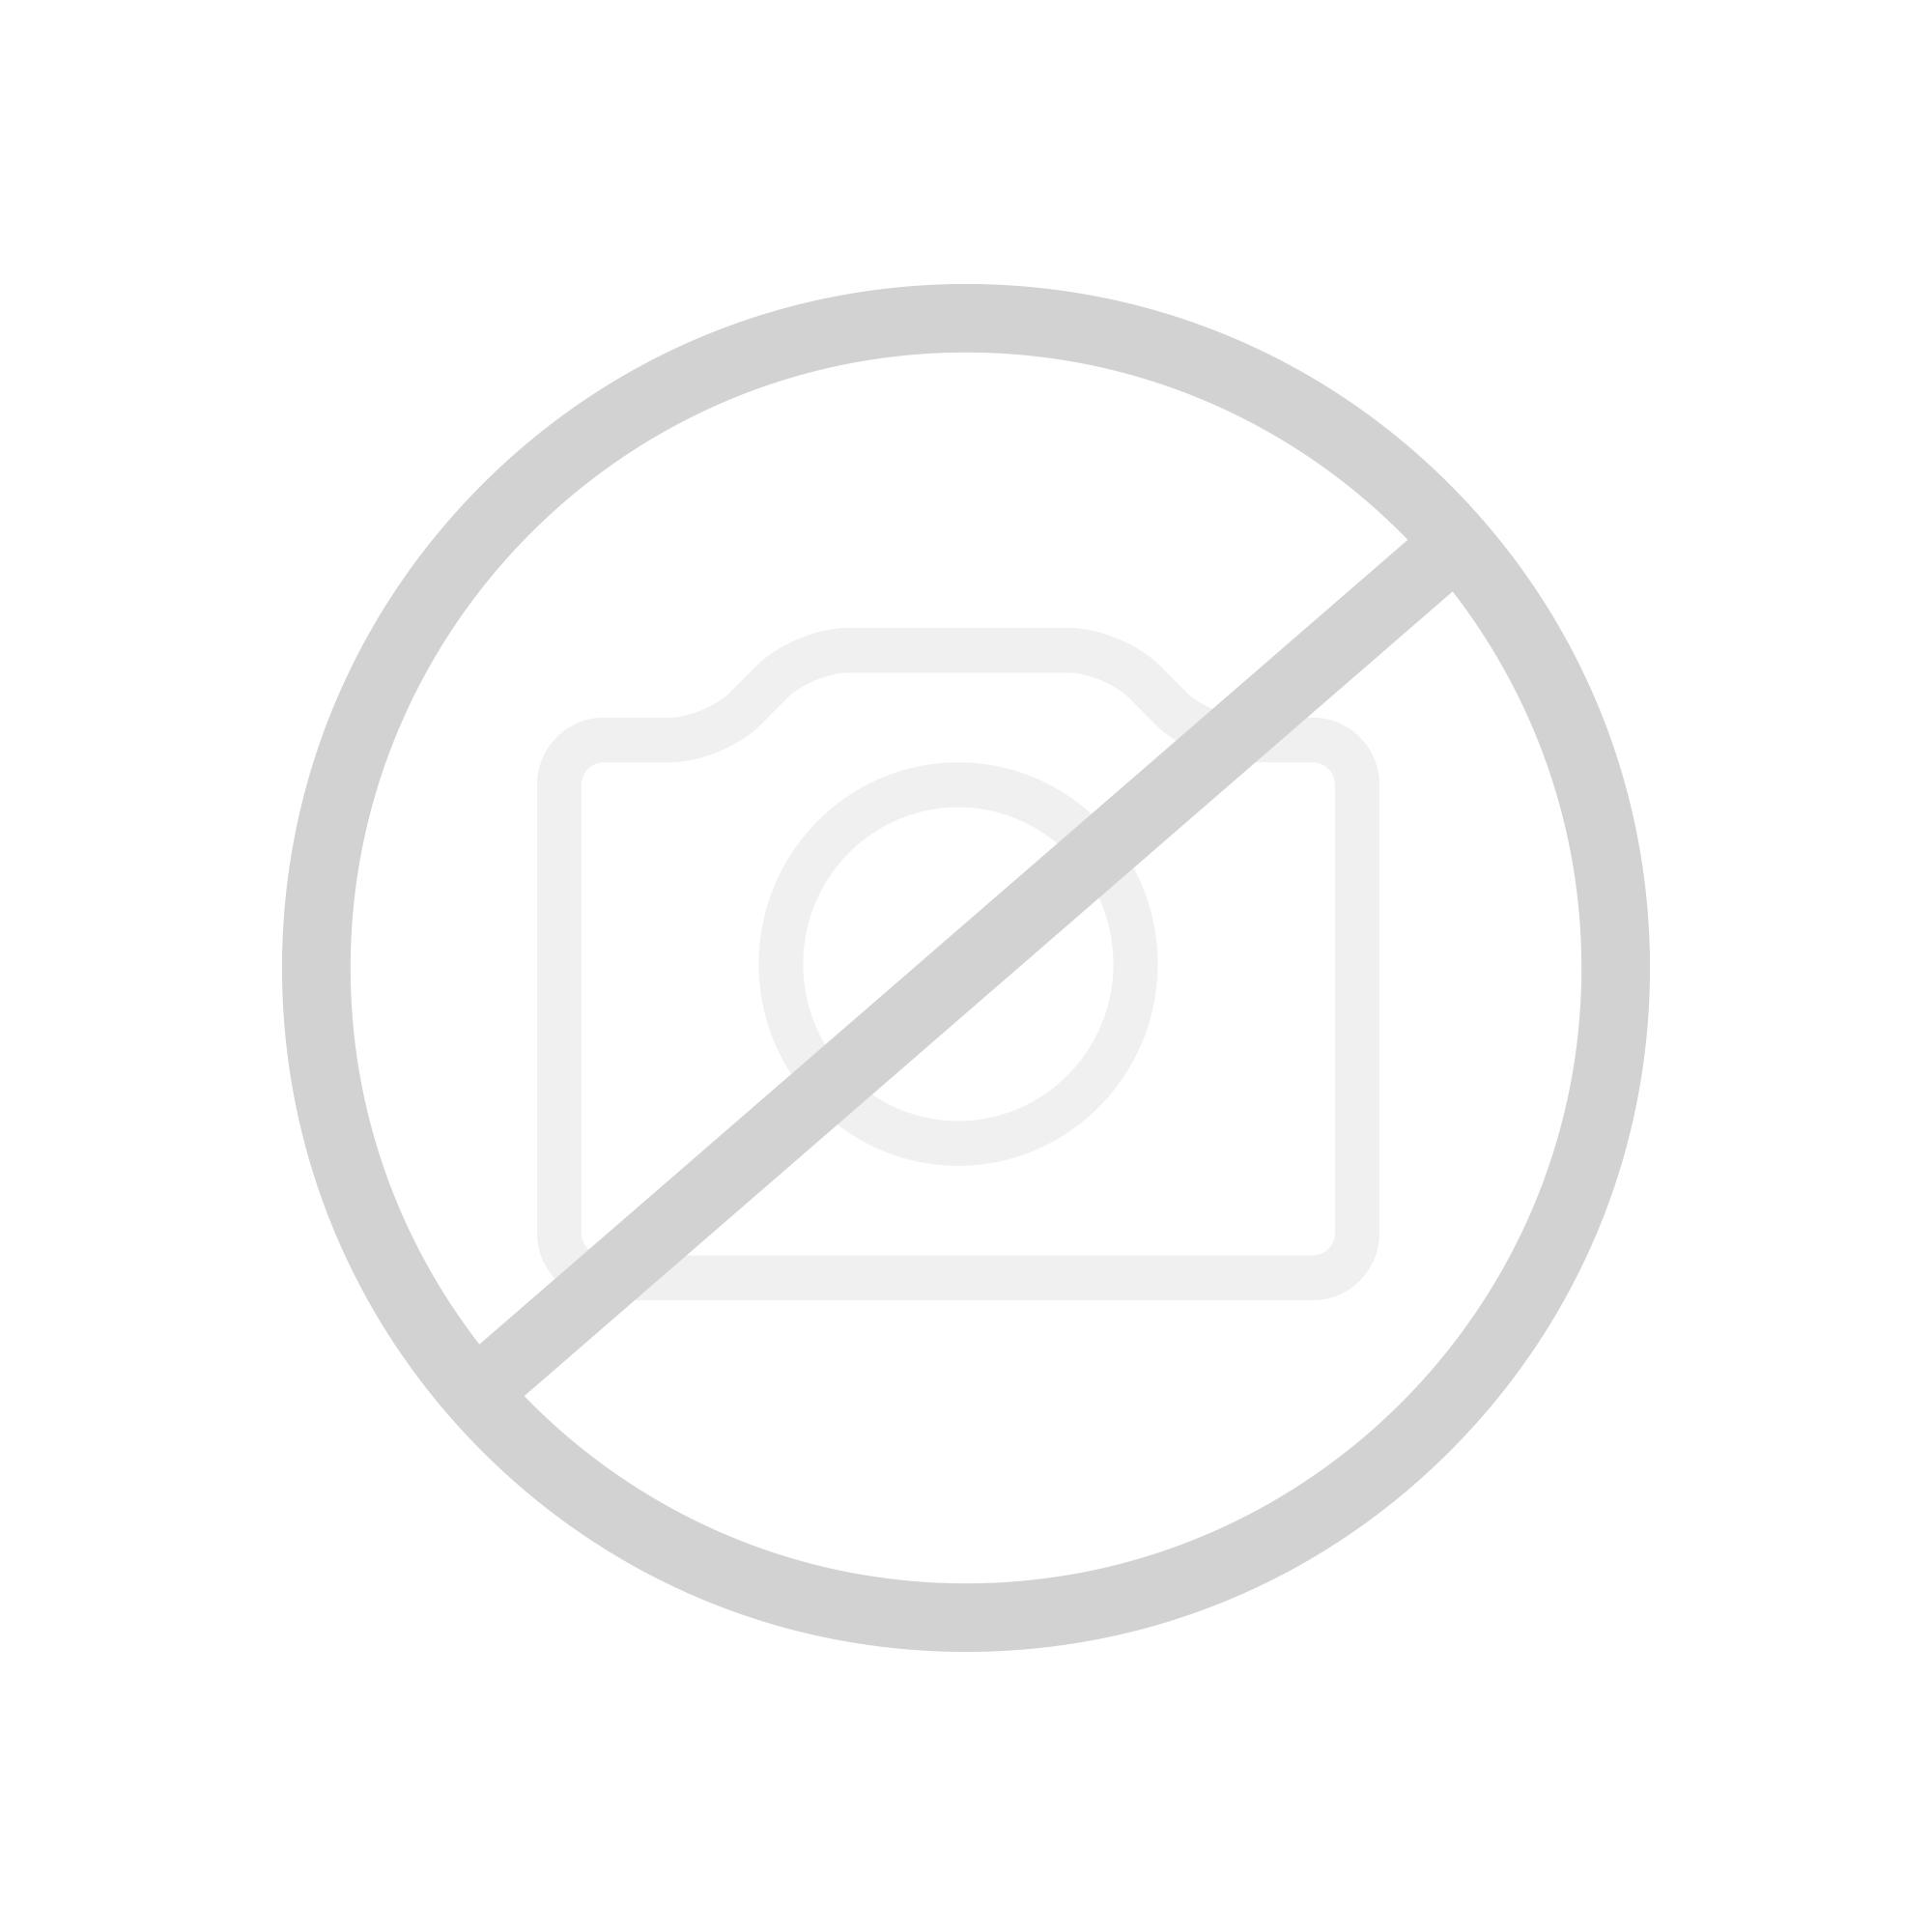 louis poulsen Toldbod 155 Pollerleuchte